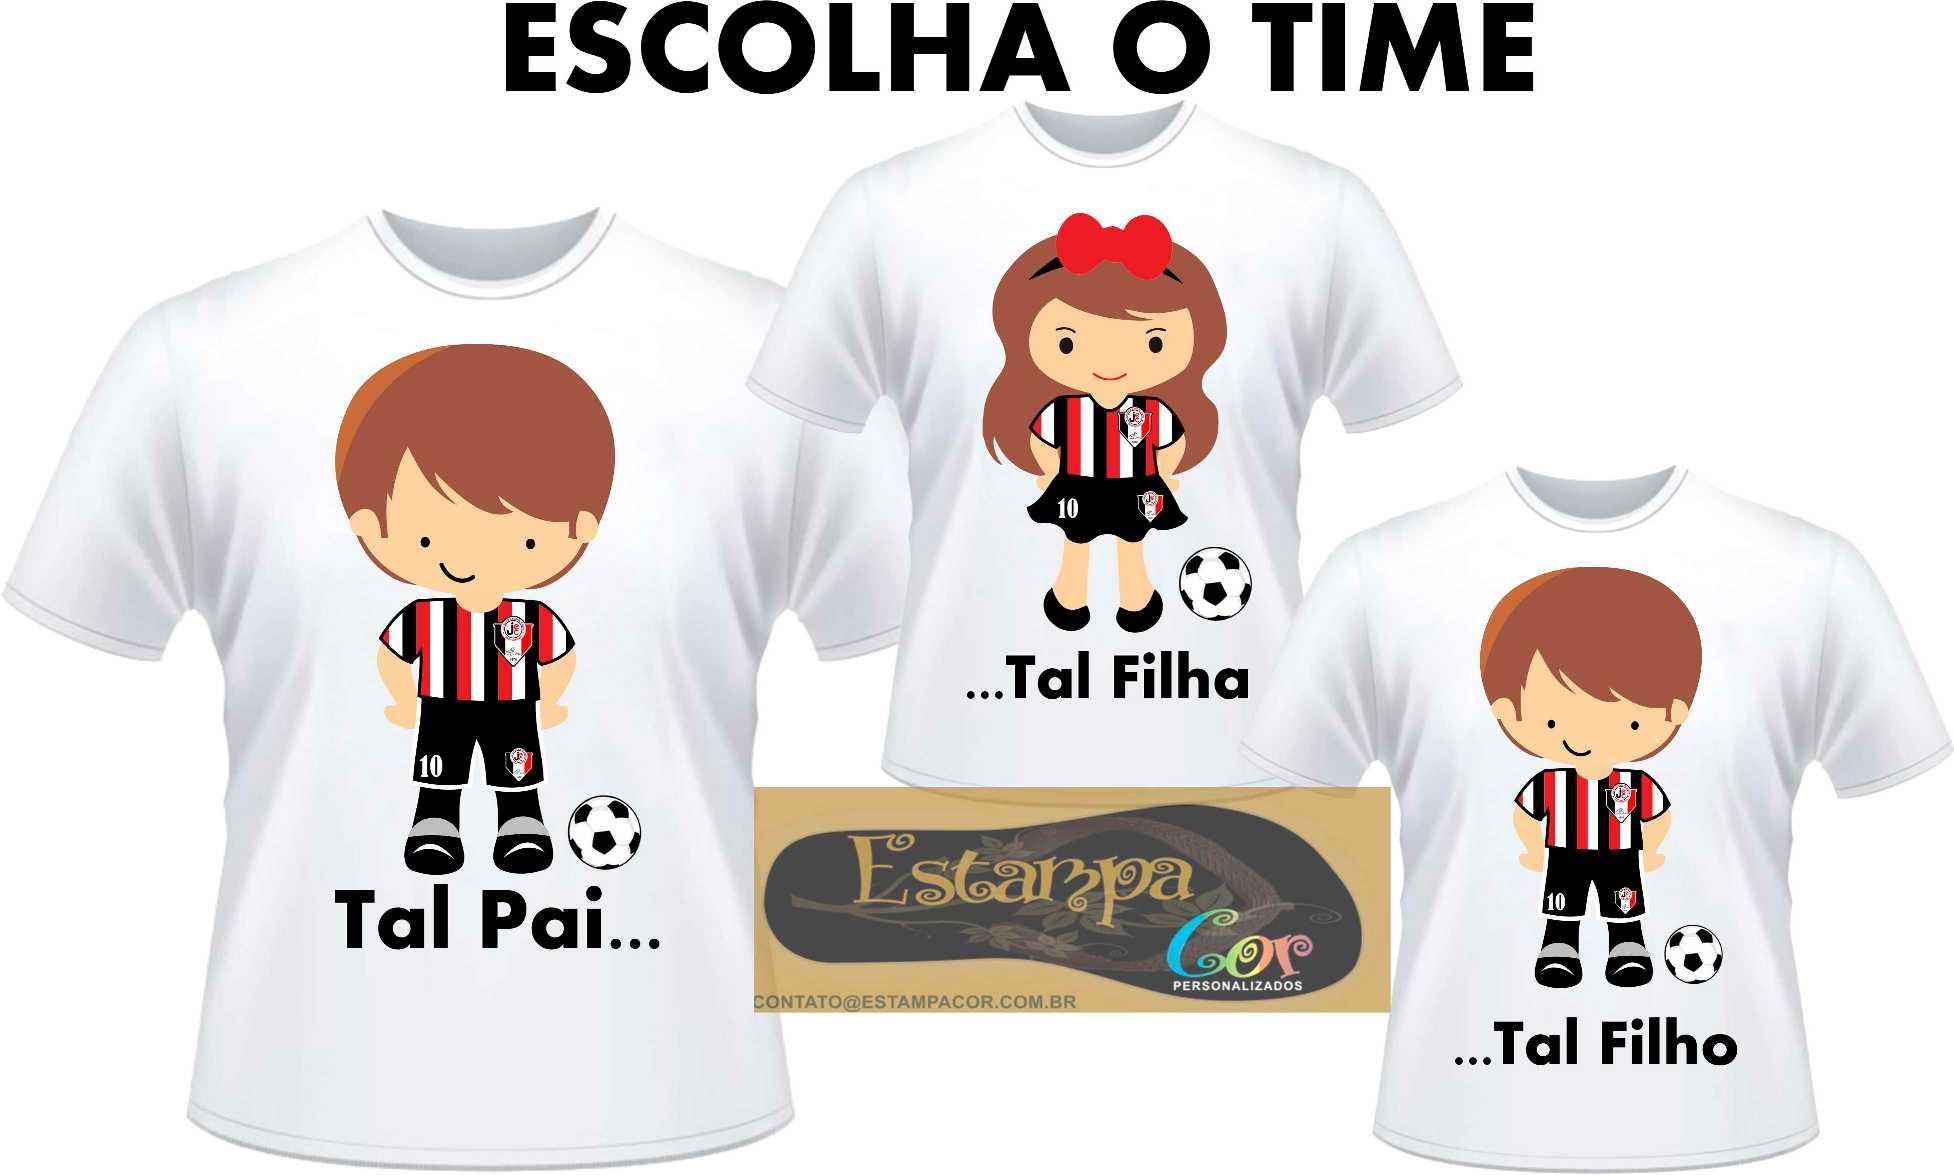 Camiseta Personalizada Tal Pai Tal Filho Diversos Times (monte o seu Kit)